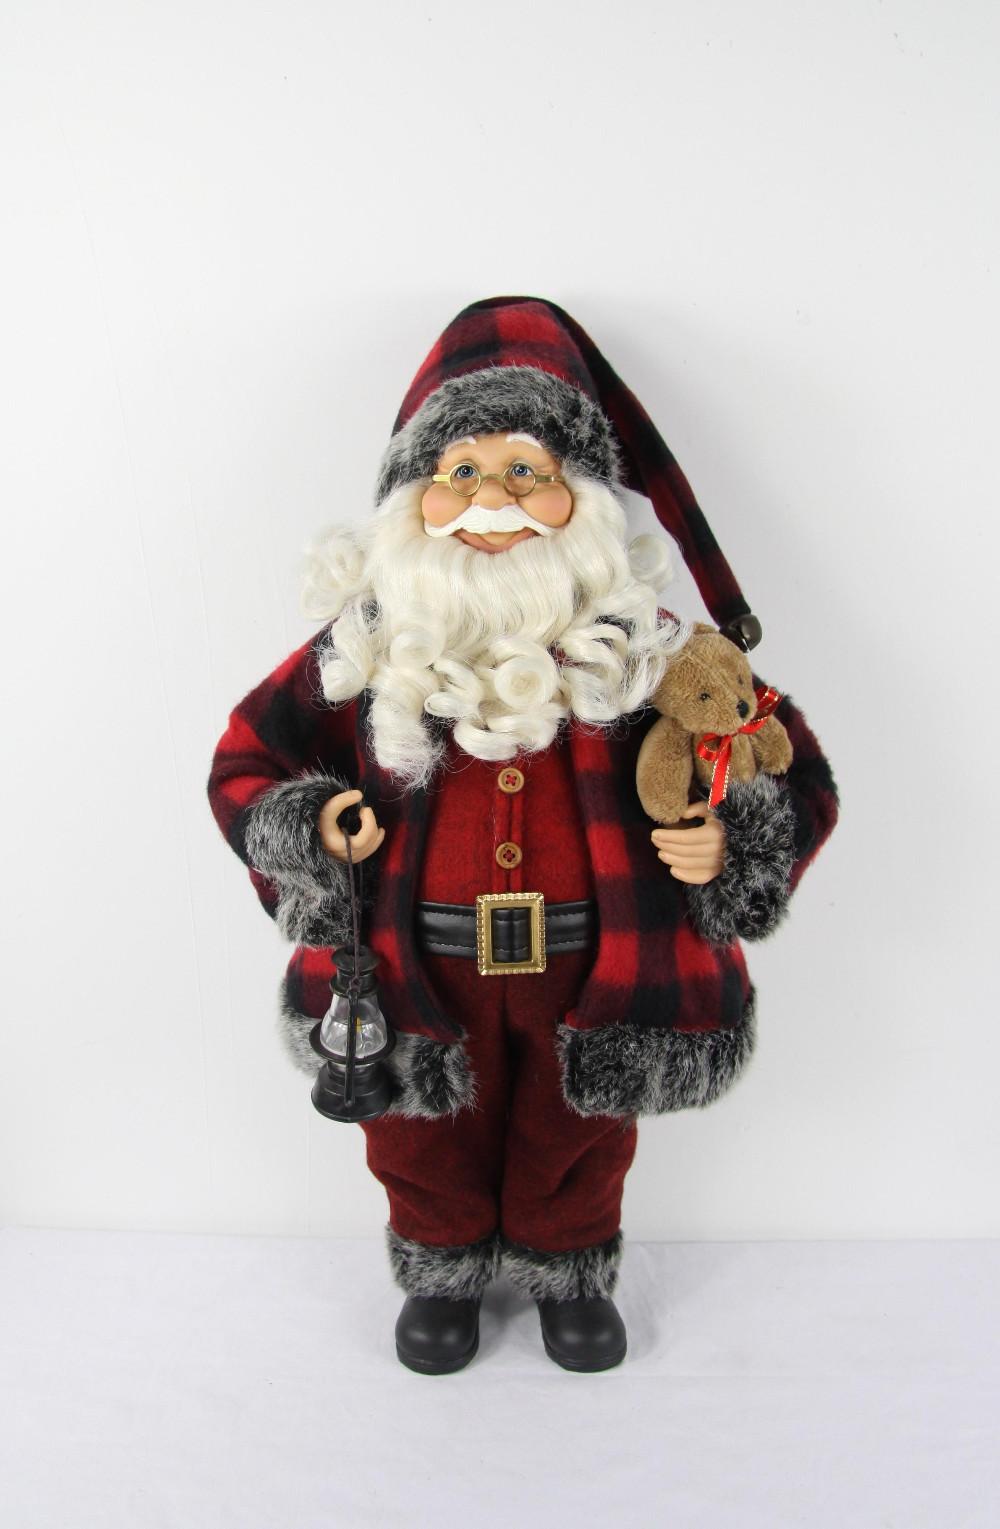 christmas santa claus adornos navidad pants gift hat bags figurine new year home decorations natale tree ornaments - shenzhen etder store